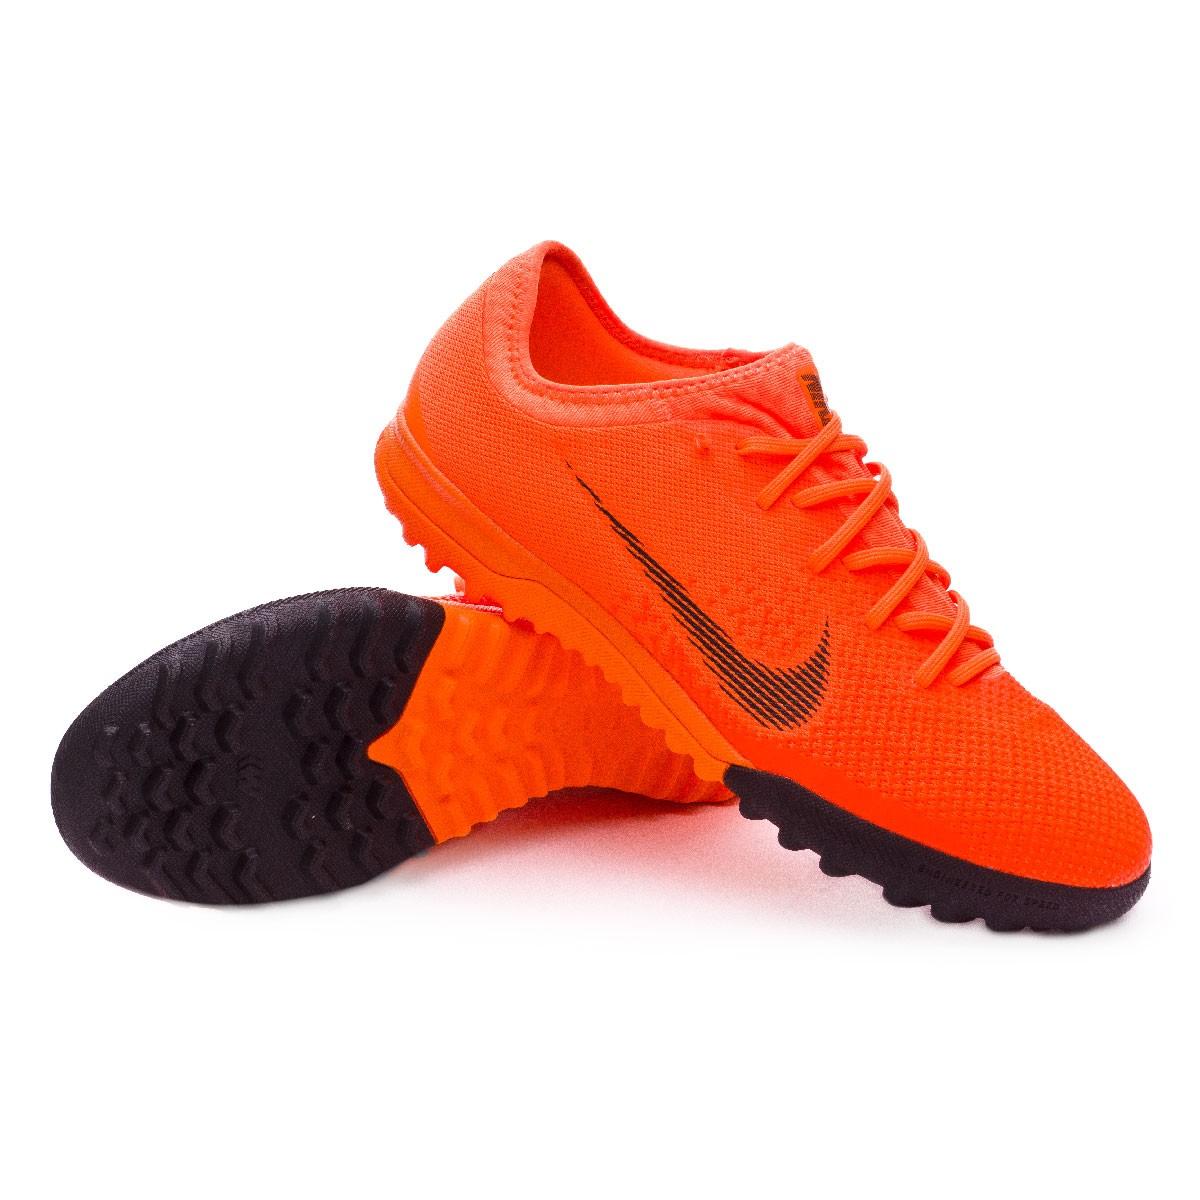 new product 2712f ab97f ... best price football boot nike mercurial vaporx xii pro turf total  orange black 04926 28d1d